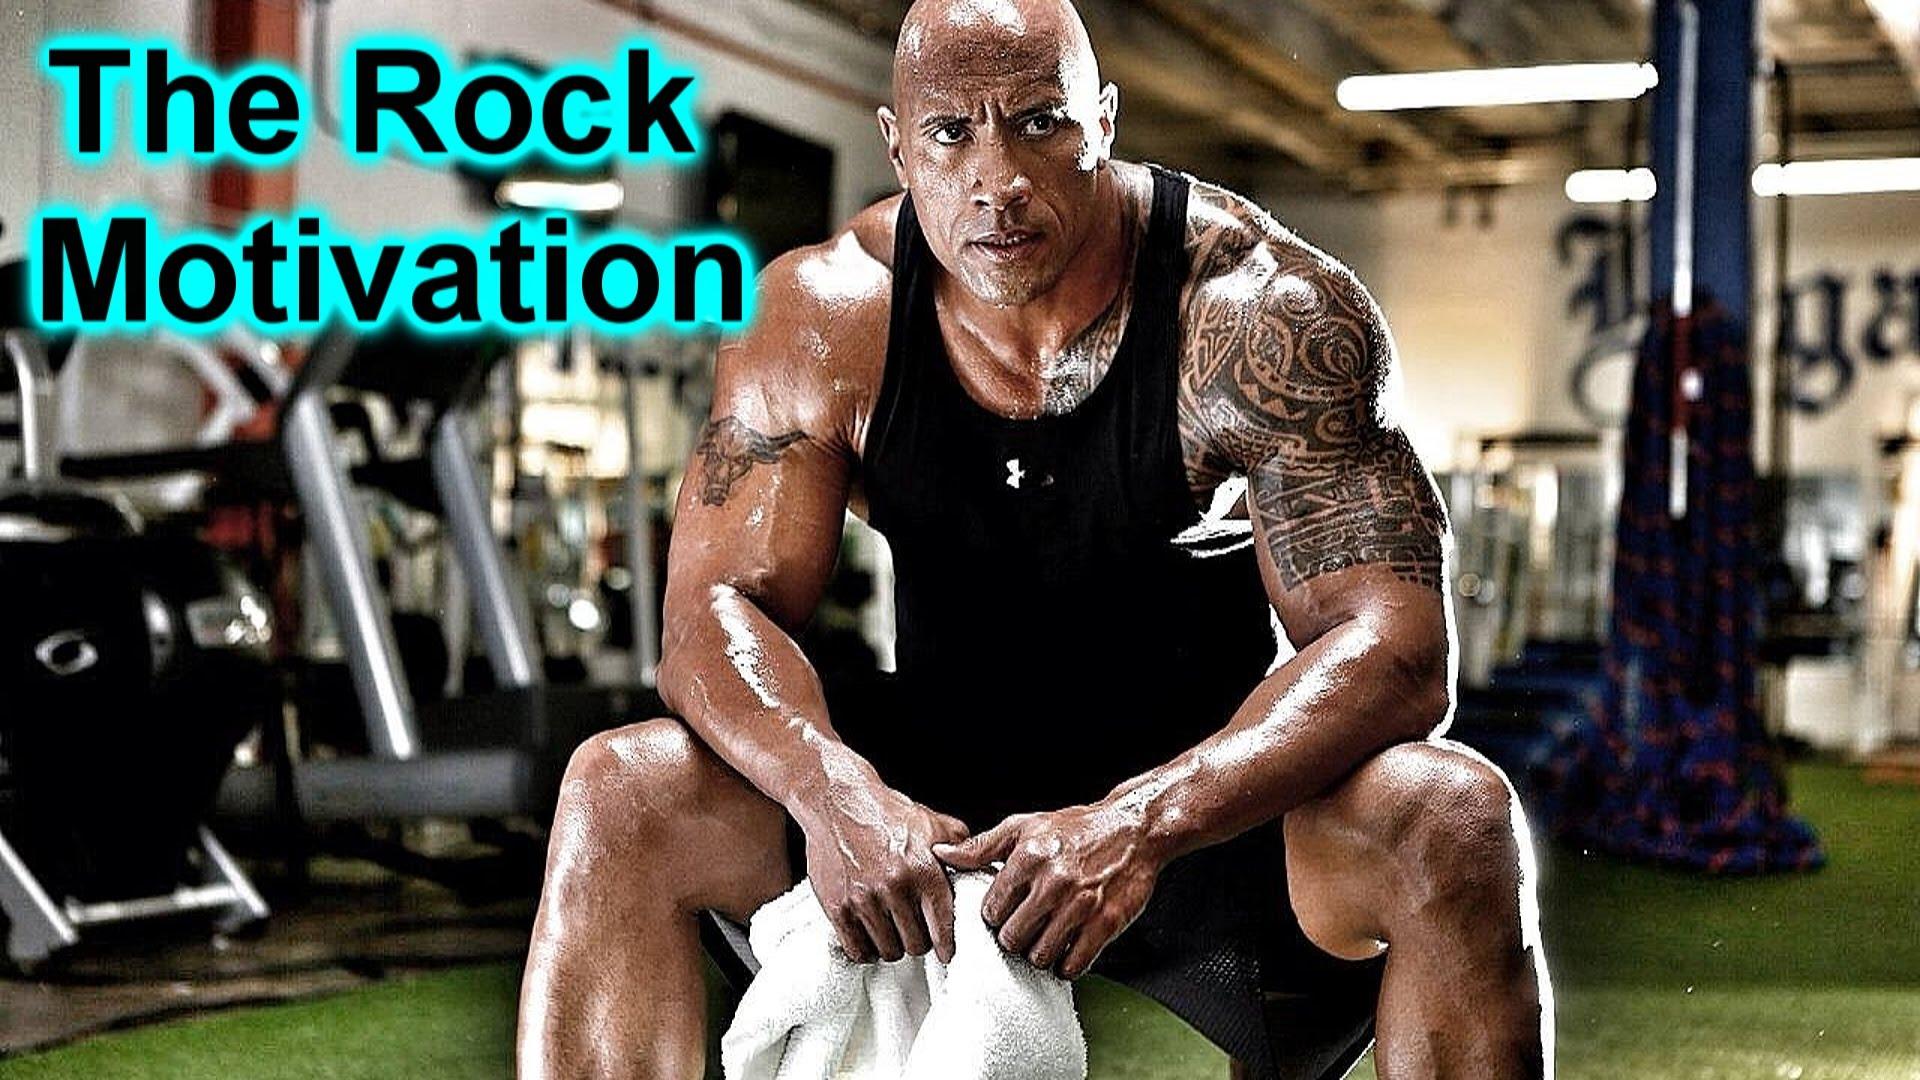 dwayne johnson bodybuilding #6